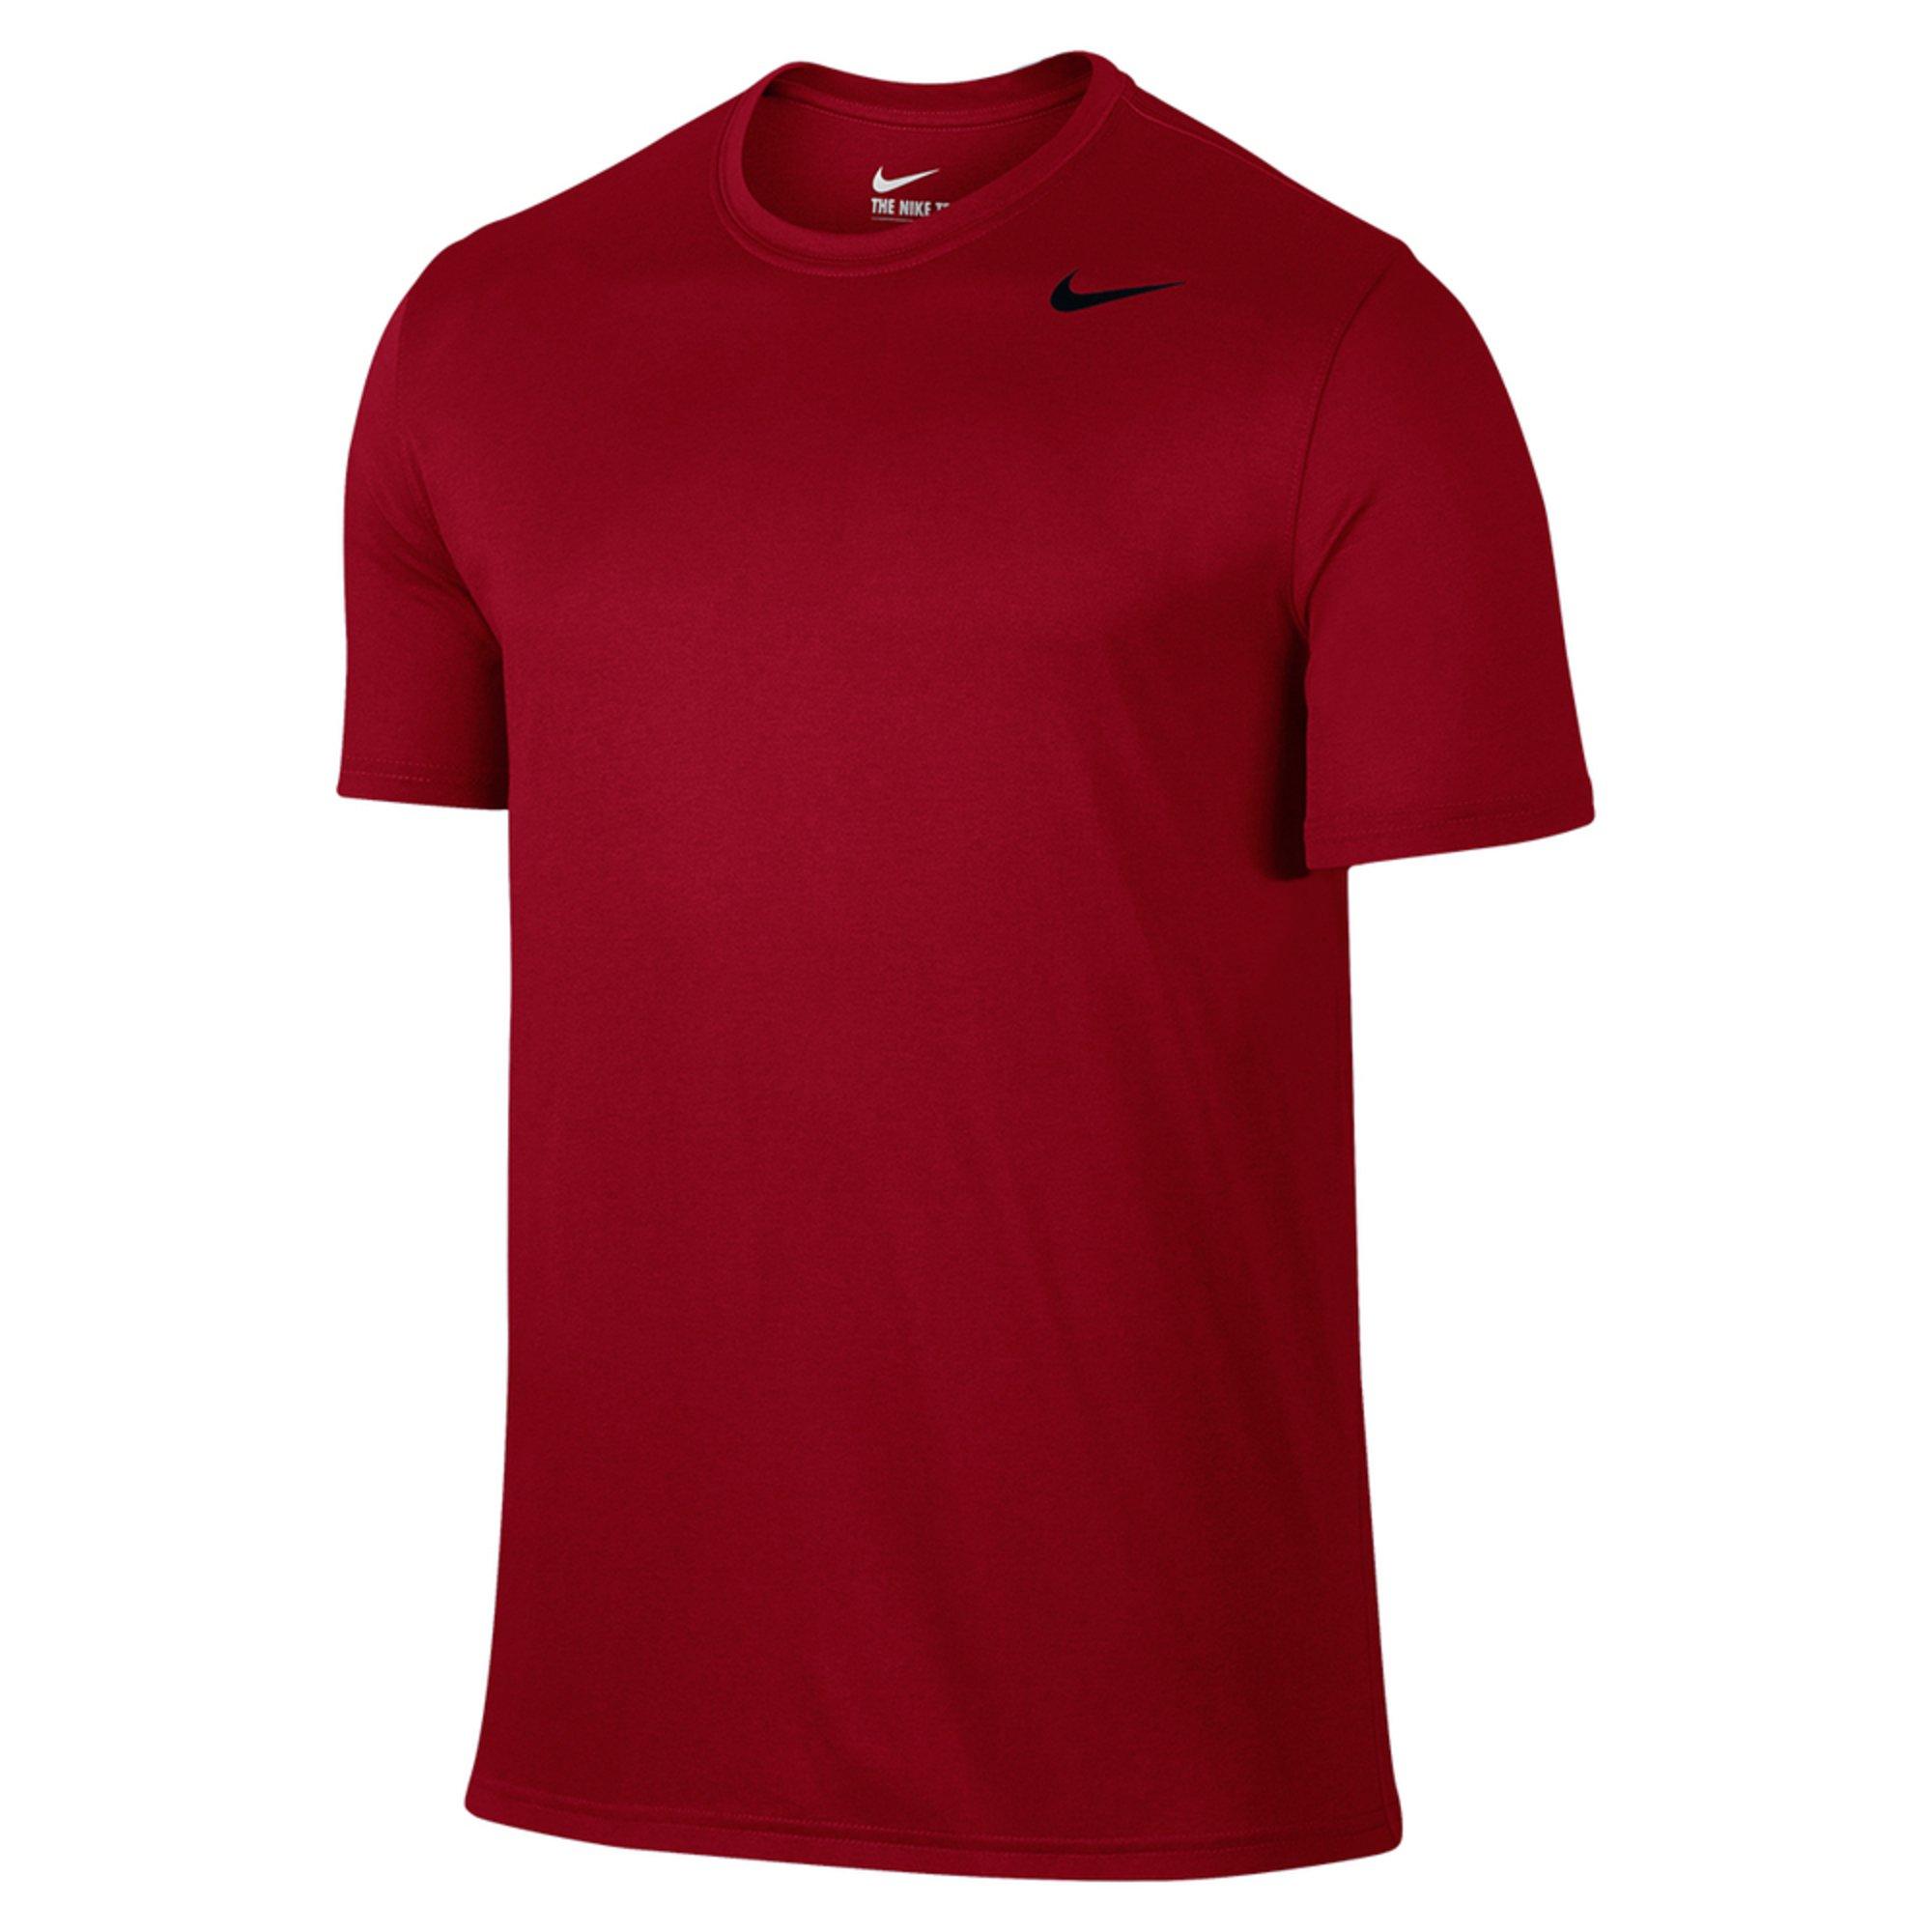 756839d2 Nike Men's Legend 2.0 Short Sleeve Tee | Active Tees | Apparel ...